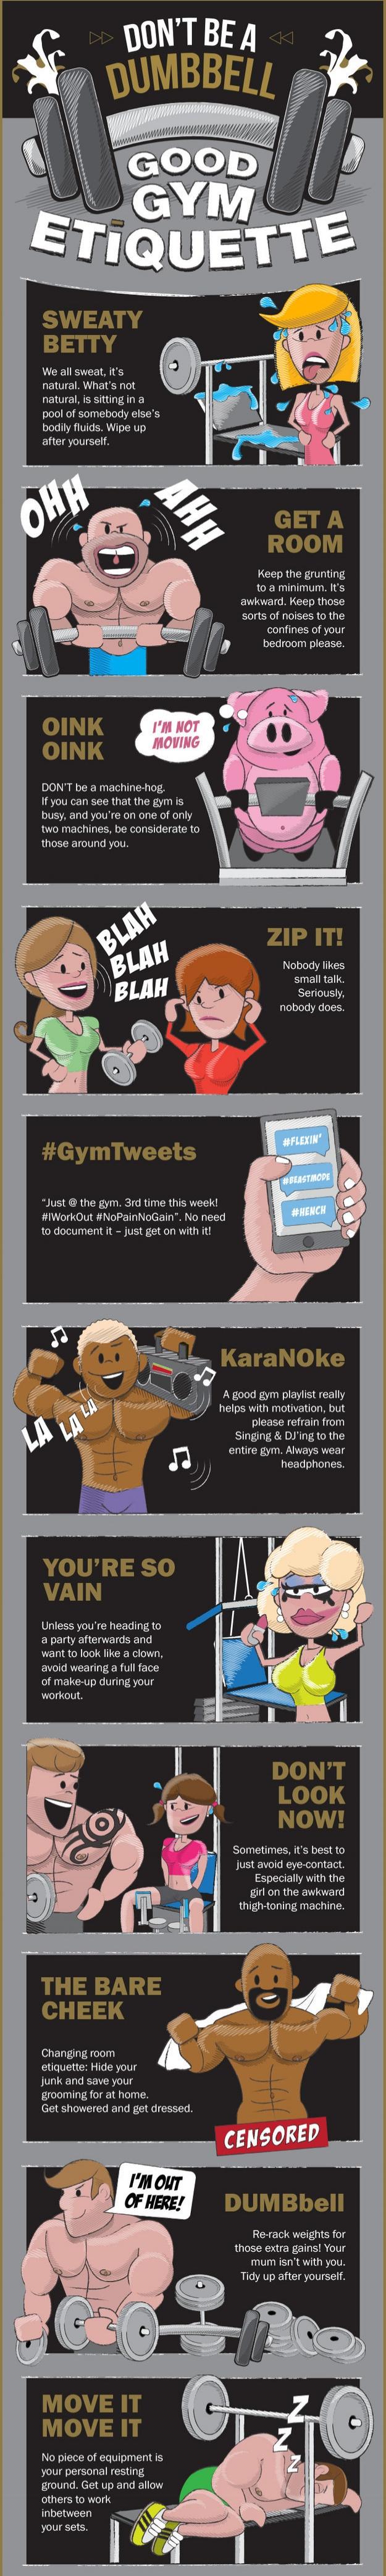 good gym etiquette rules klub athletik griffintown montreal gym